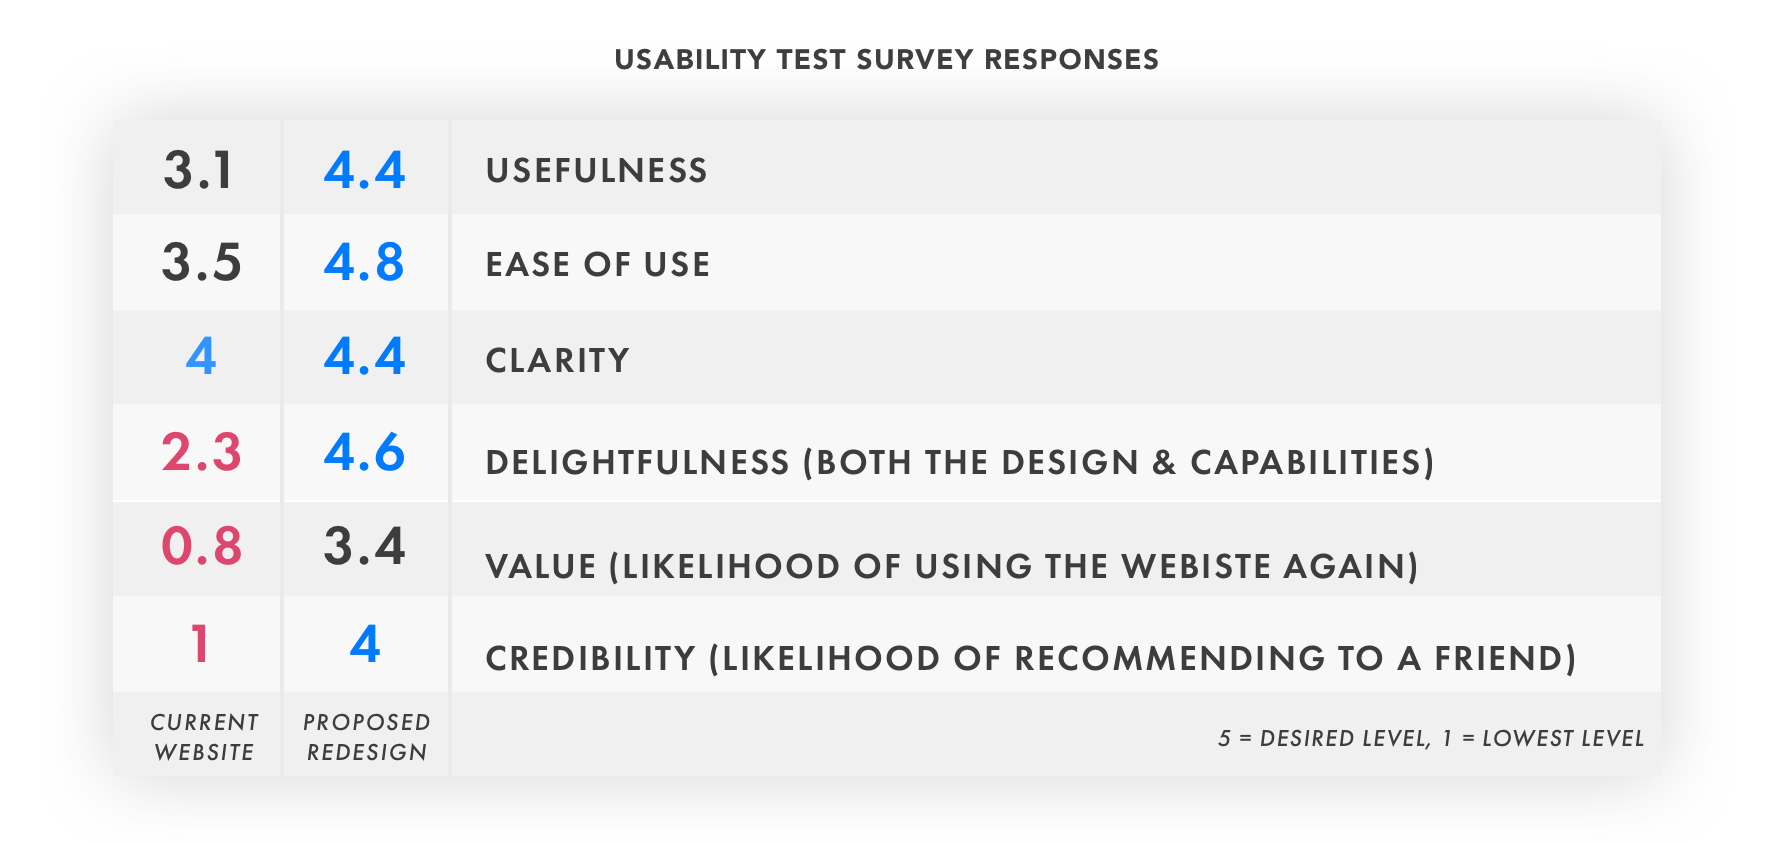 USABILITY TEST SURVEY RESPONSES_CHART_V1.png